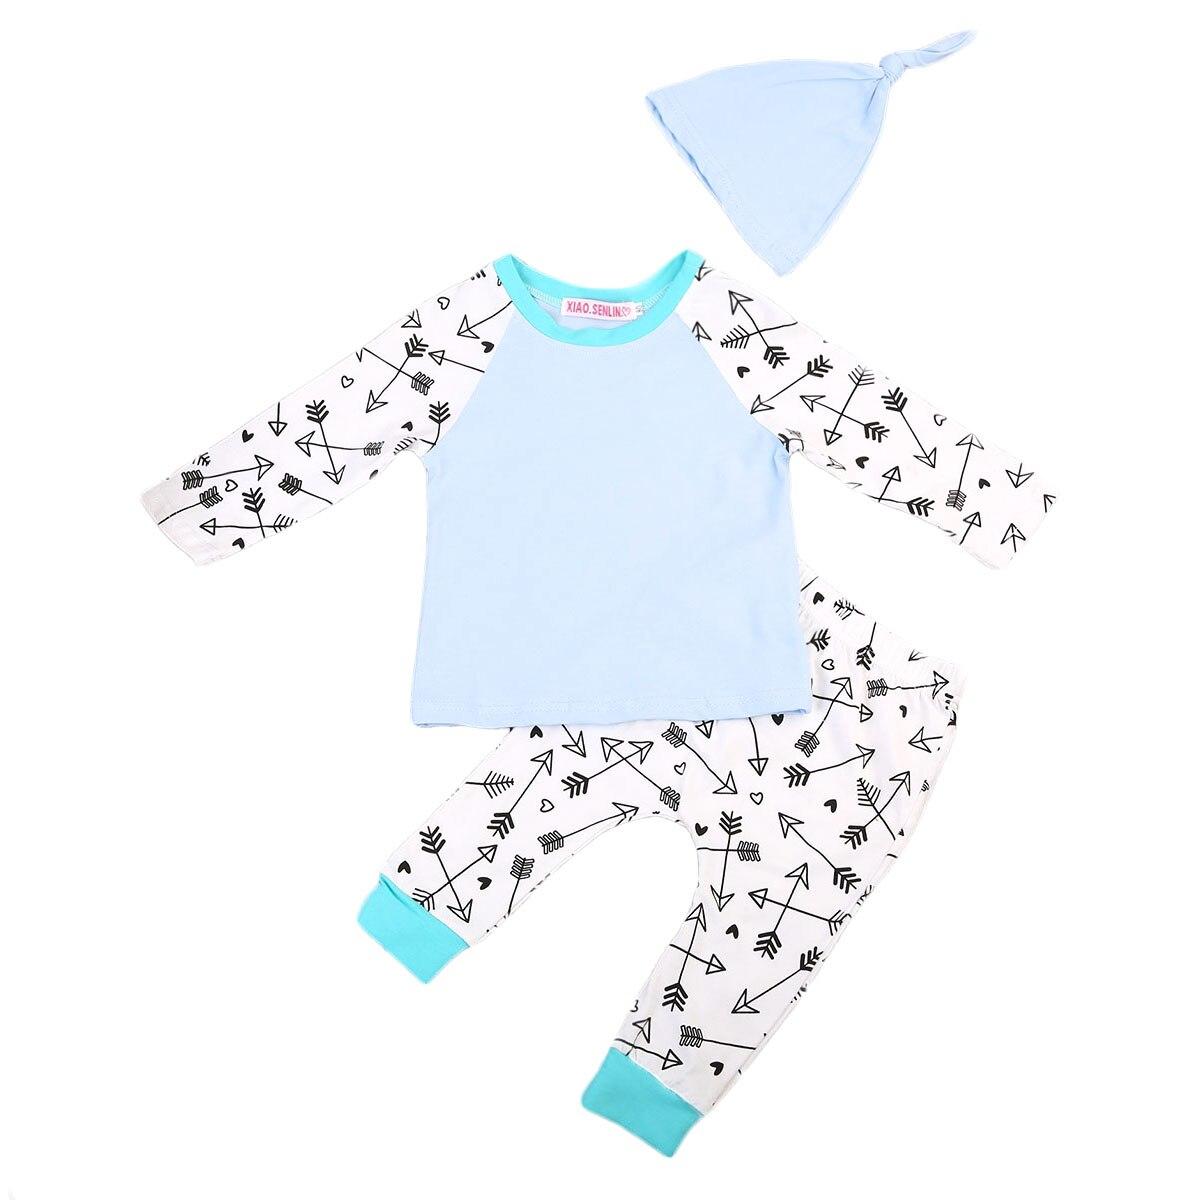 Autumn Winter Baby Boys Casual Long Sleeve Tops+ Arrow Pants+Hat 3PCS Outfits Set Clothes 0-24M AU